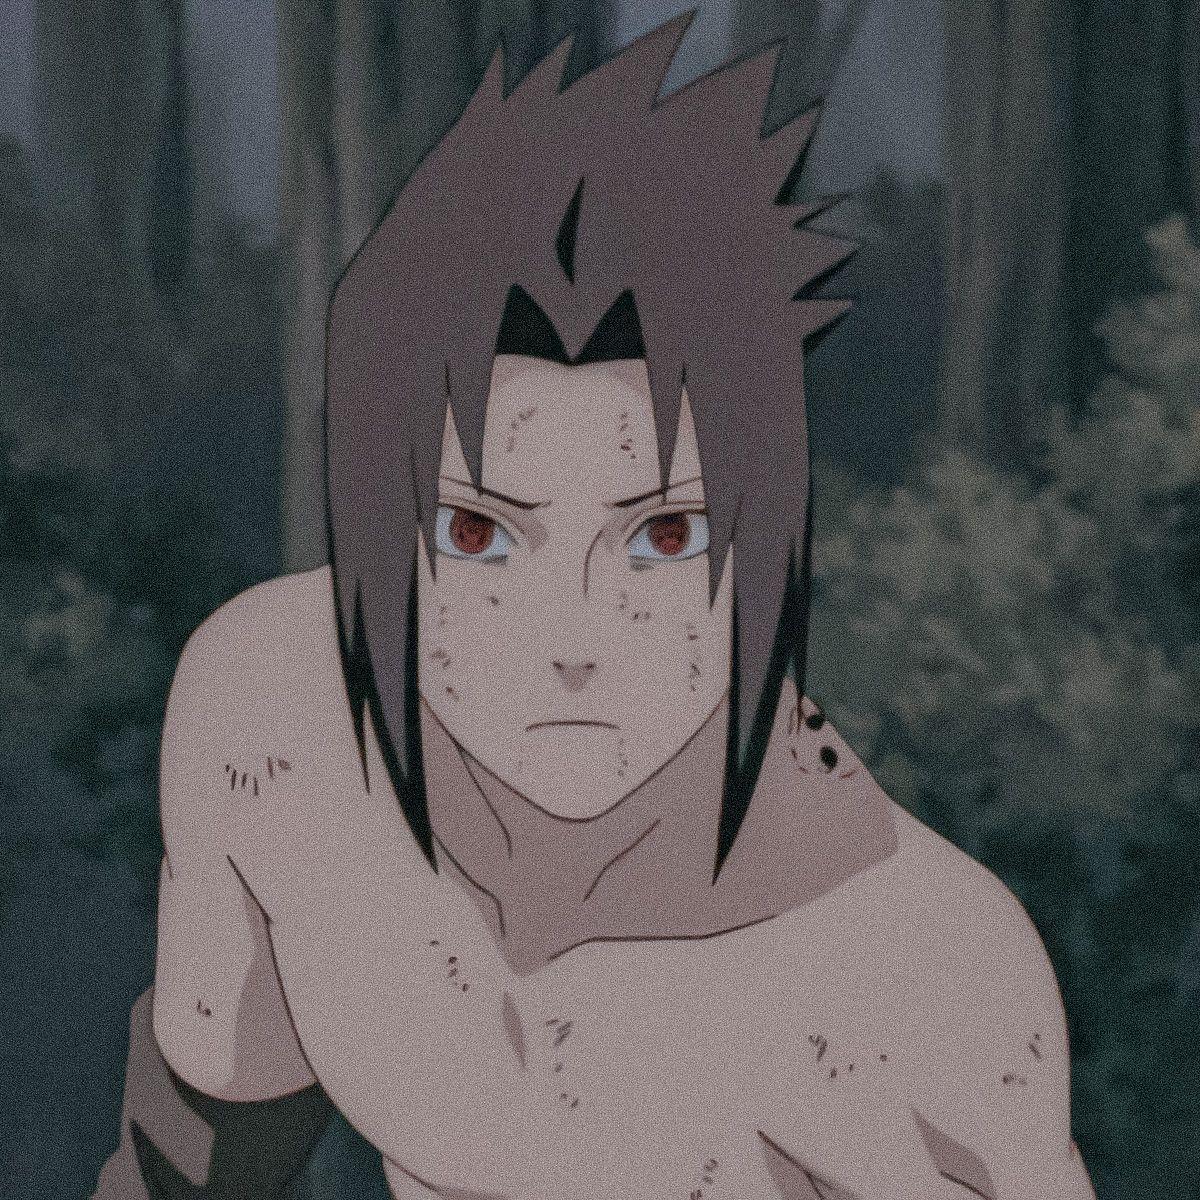 افاتار ساسكي Anime Sasuke Uchiha Sasuke